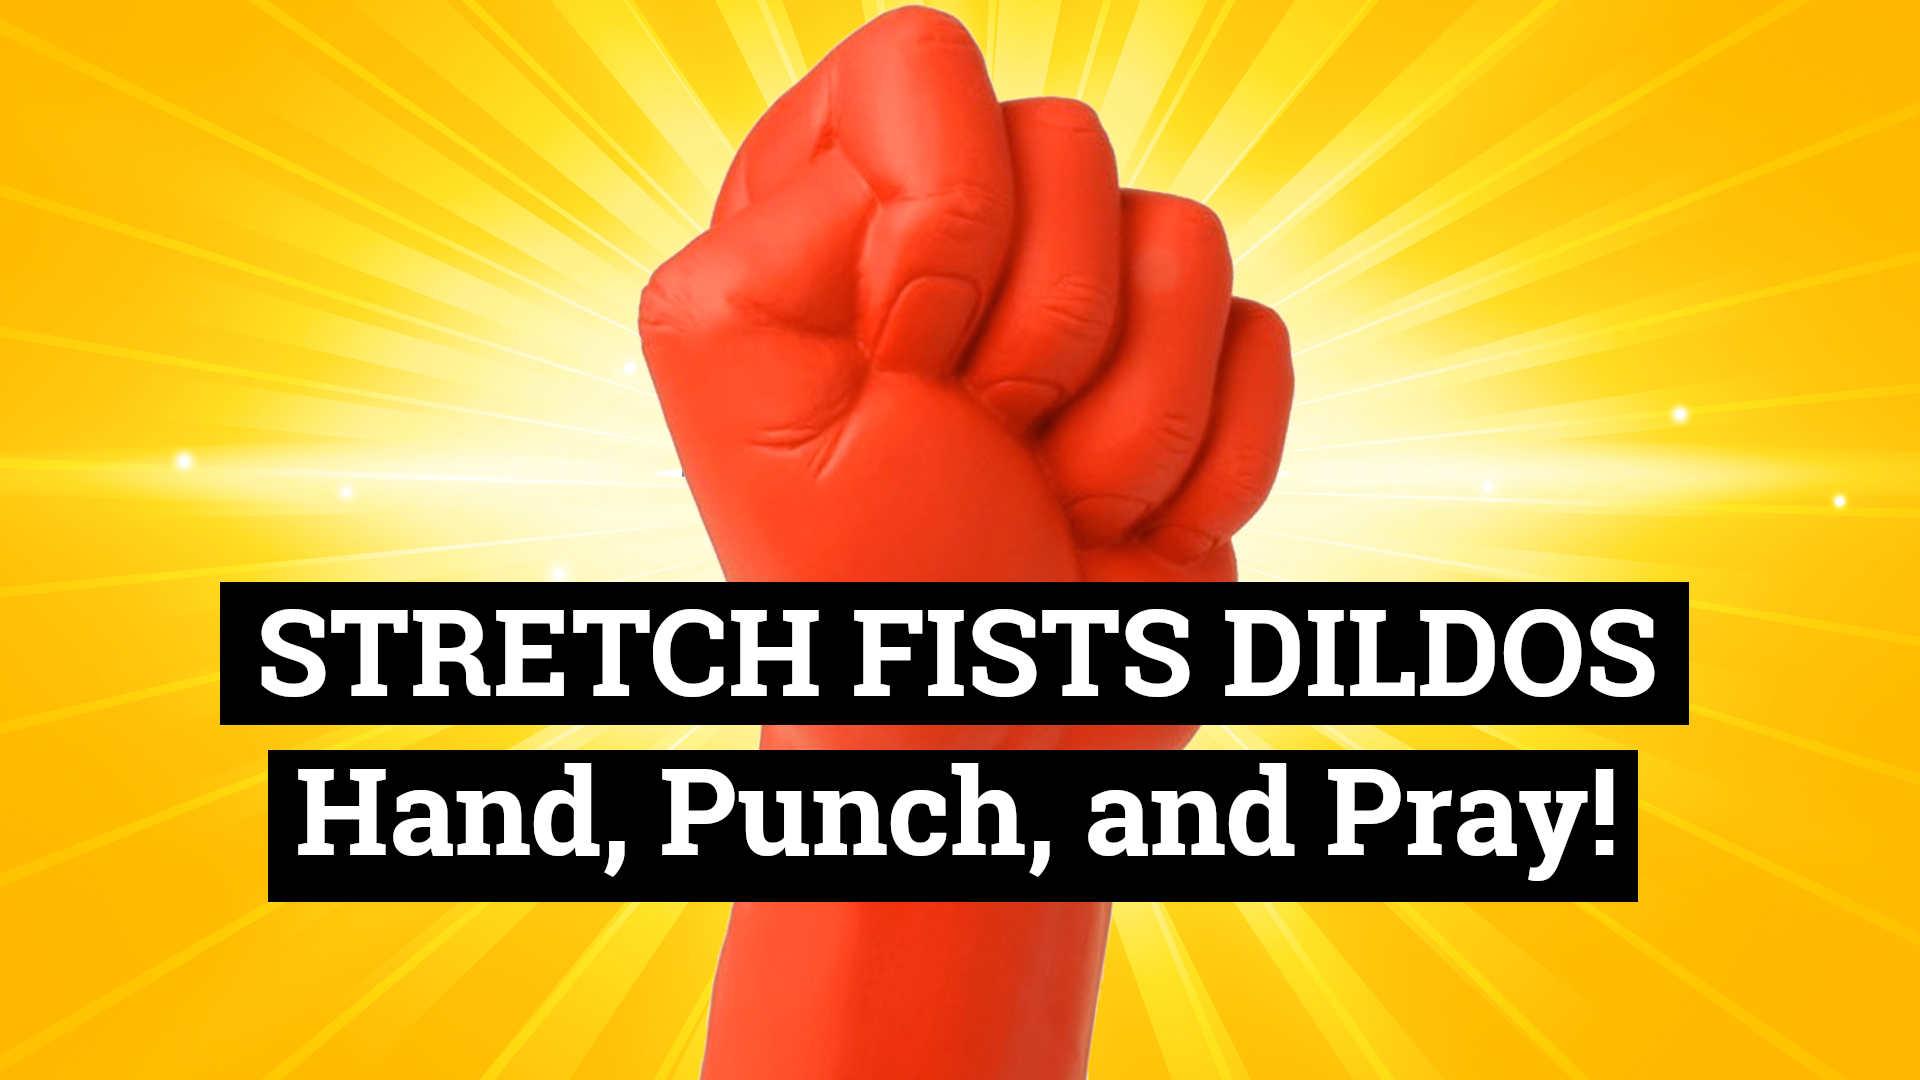 Fists dildos